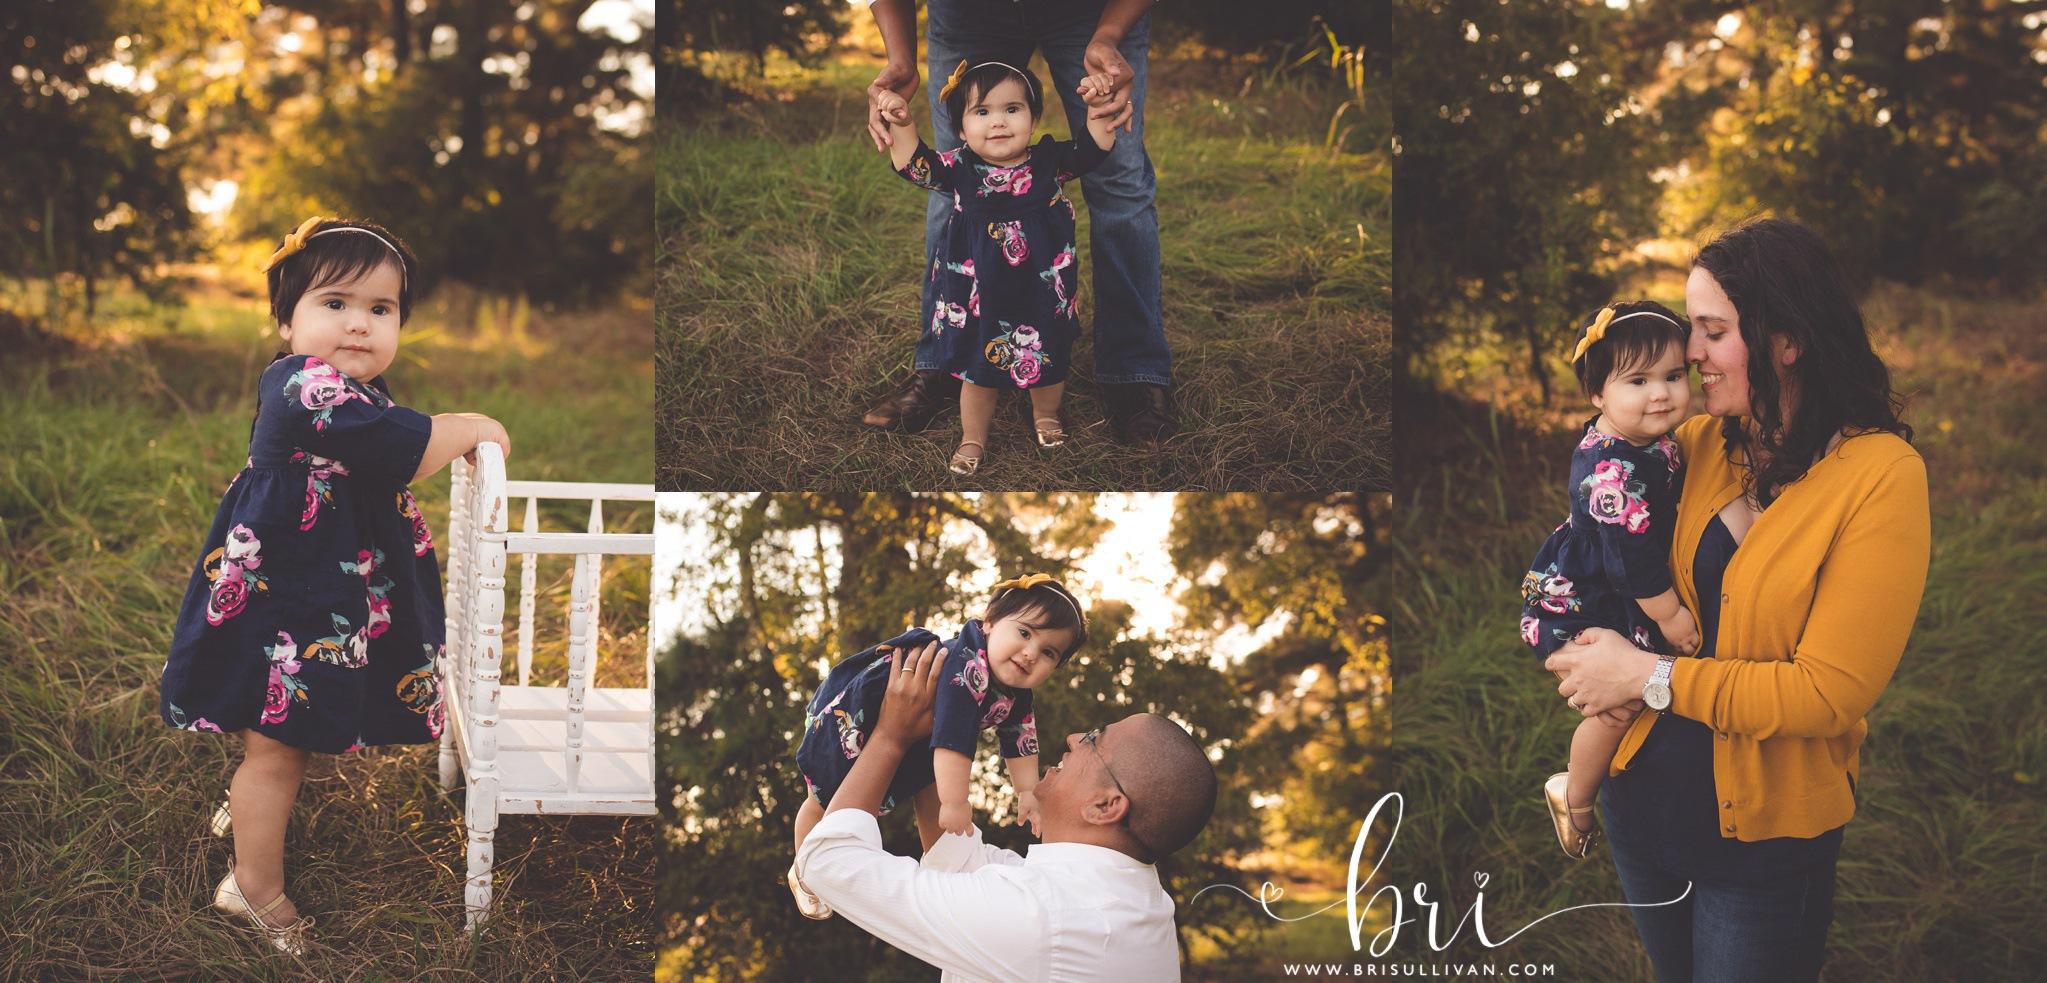 Houston Family Photography by Bri Sullivan by cherrystreetphoto